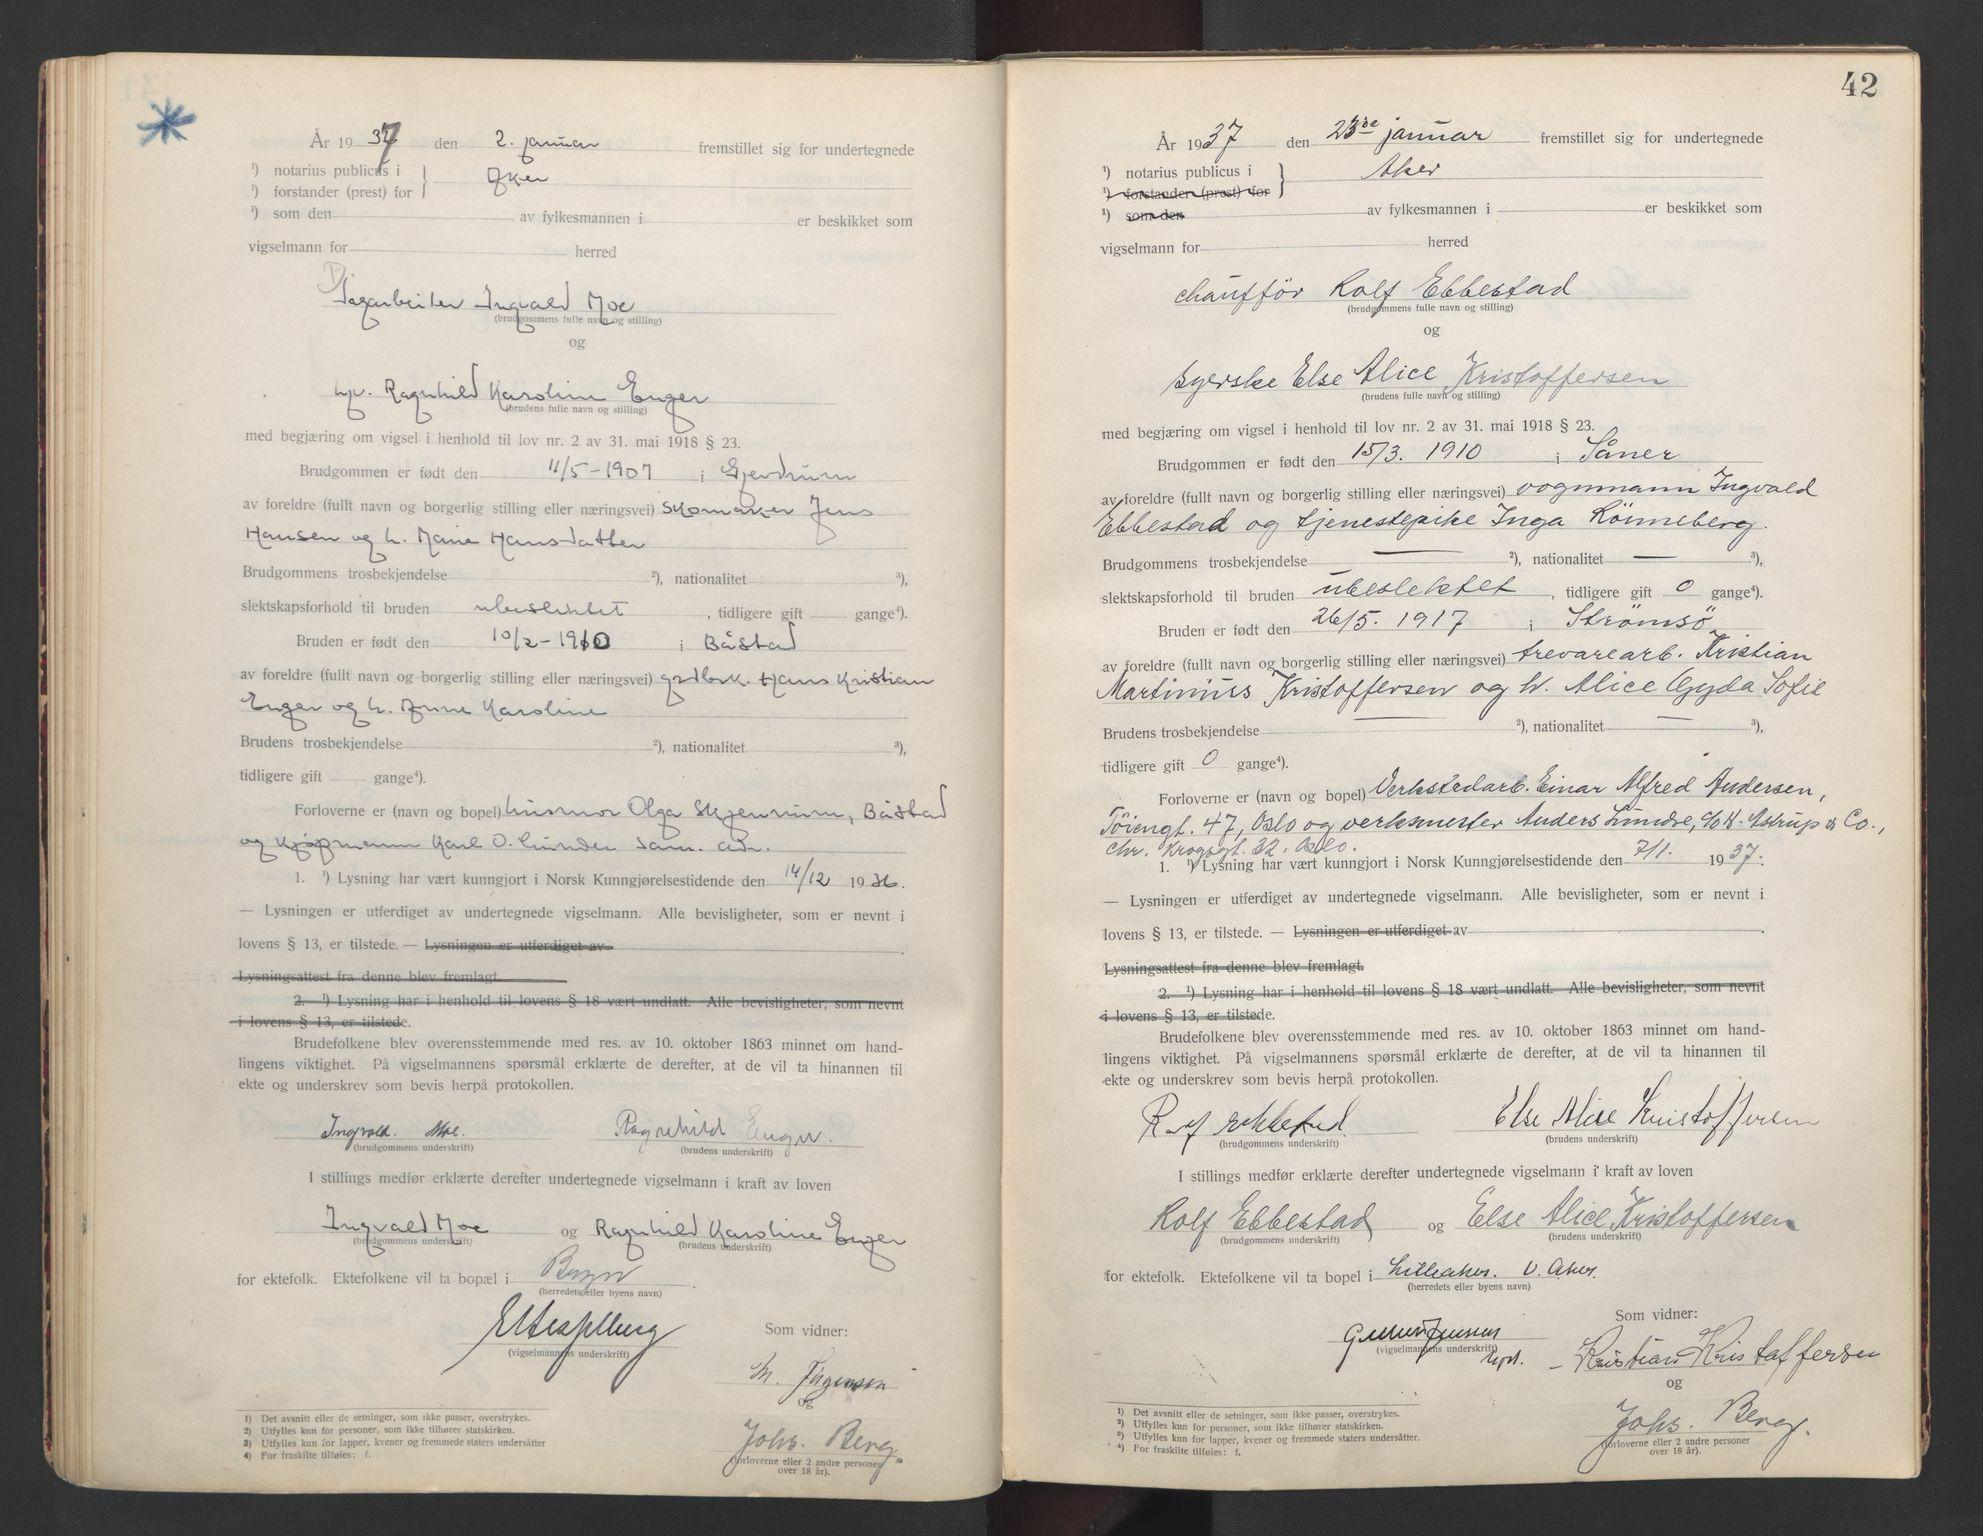 SAO, Aker sorenskriveri, L/Lc/Lcb/L0009: Vigselprotokoll, 1936-1937, s. 42